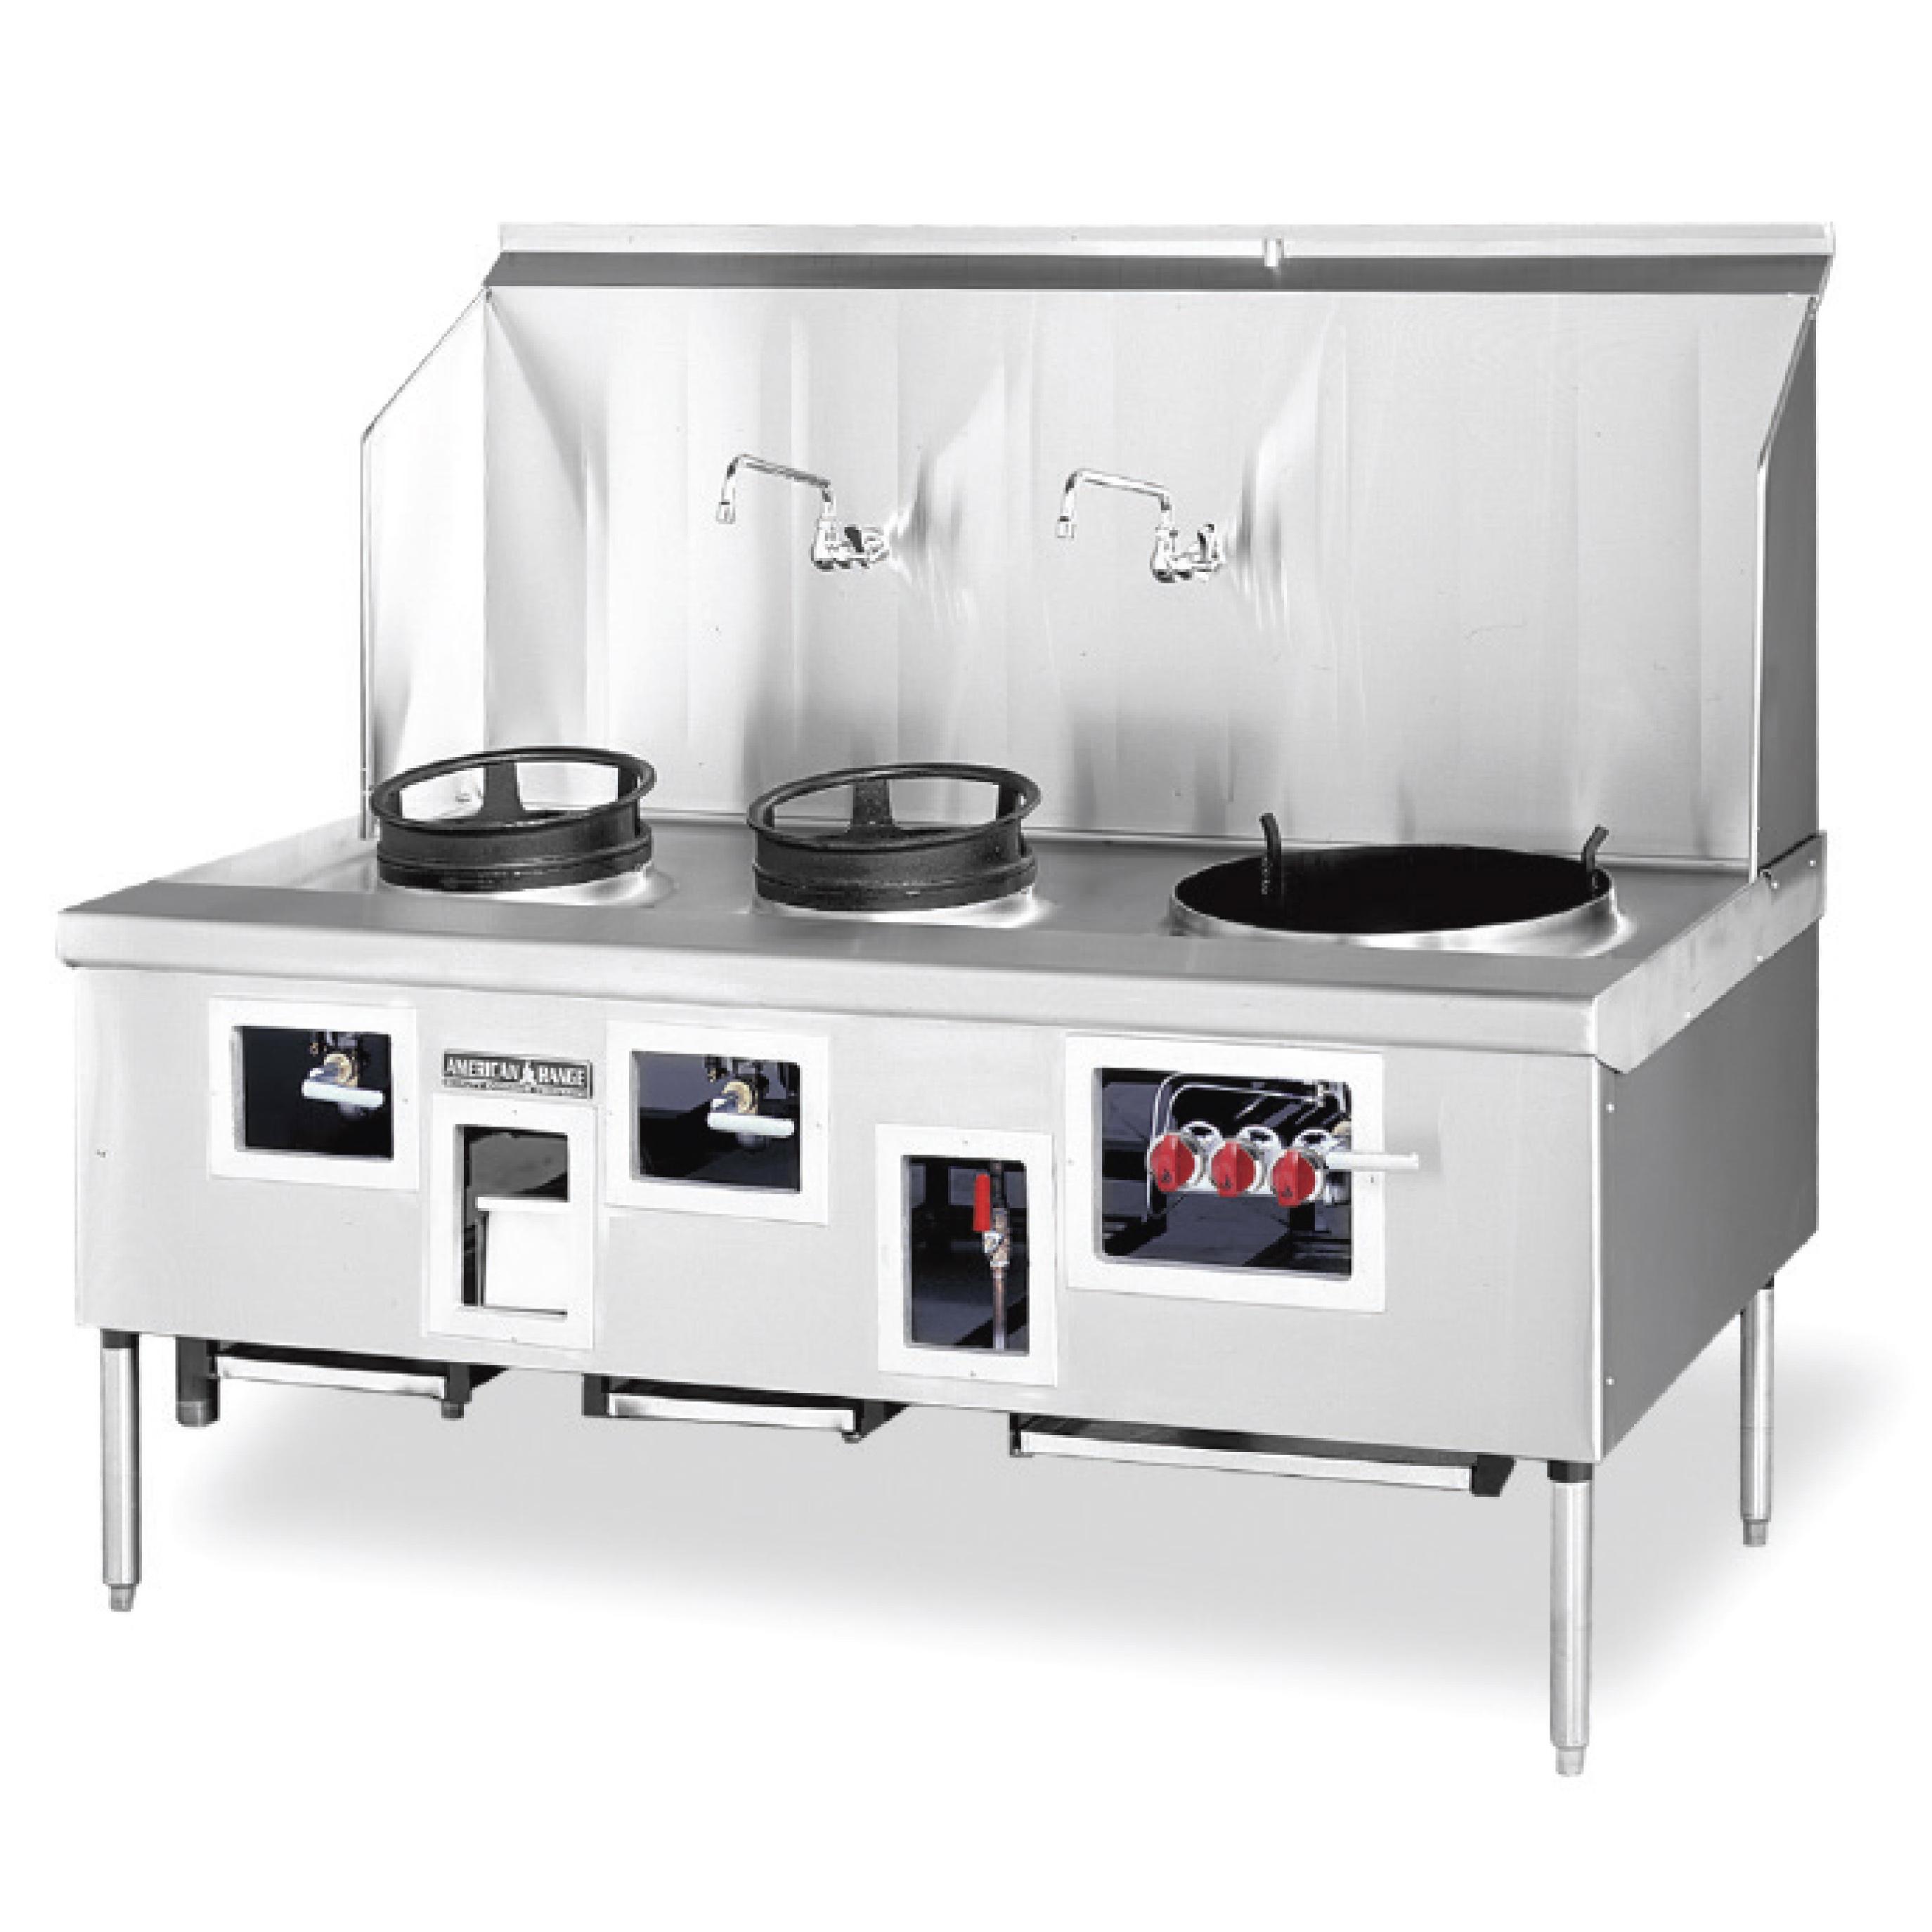 American Range ARCR-1 range, wok, gas